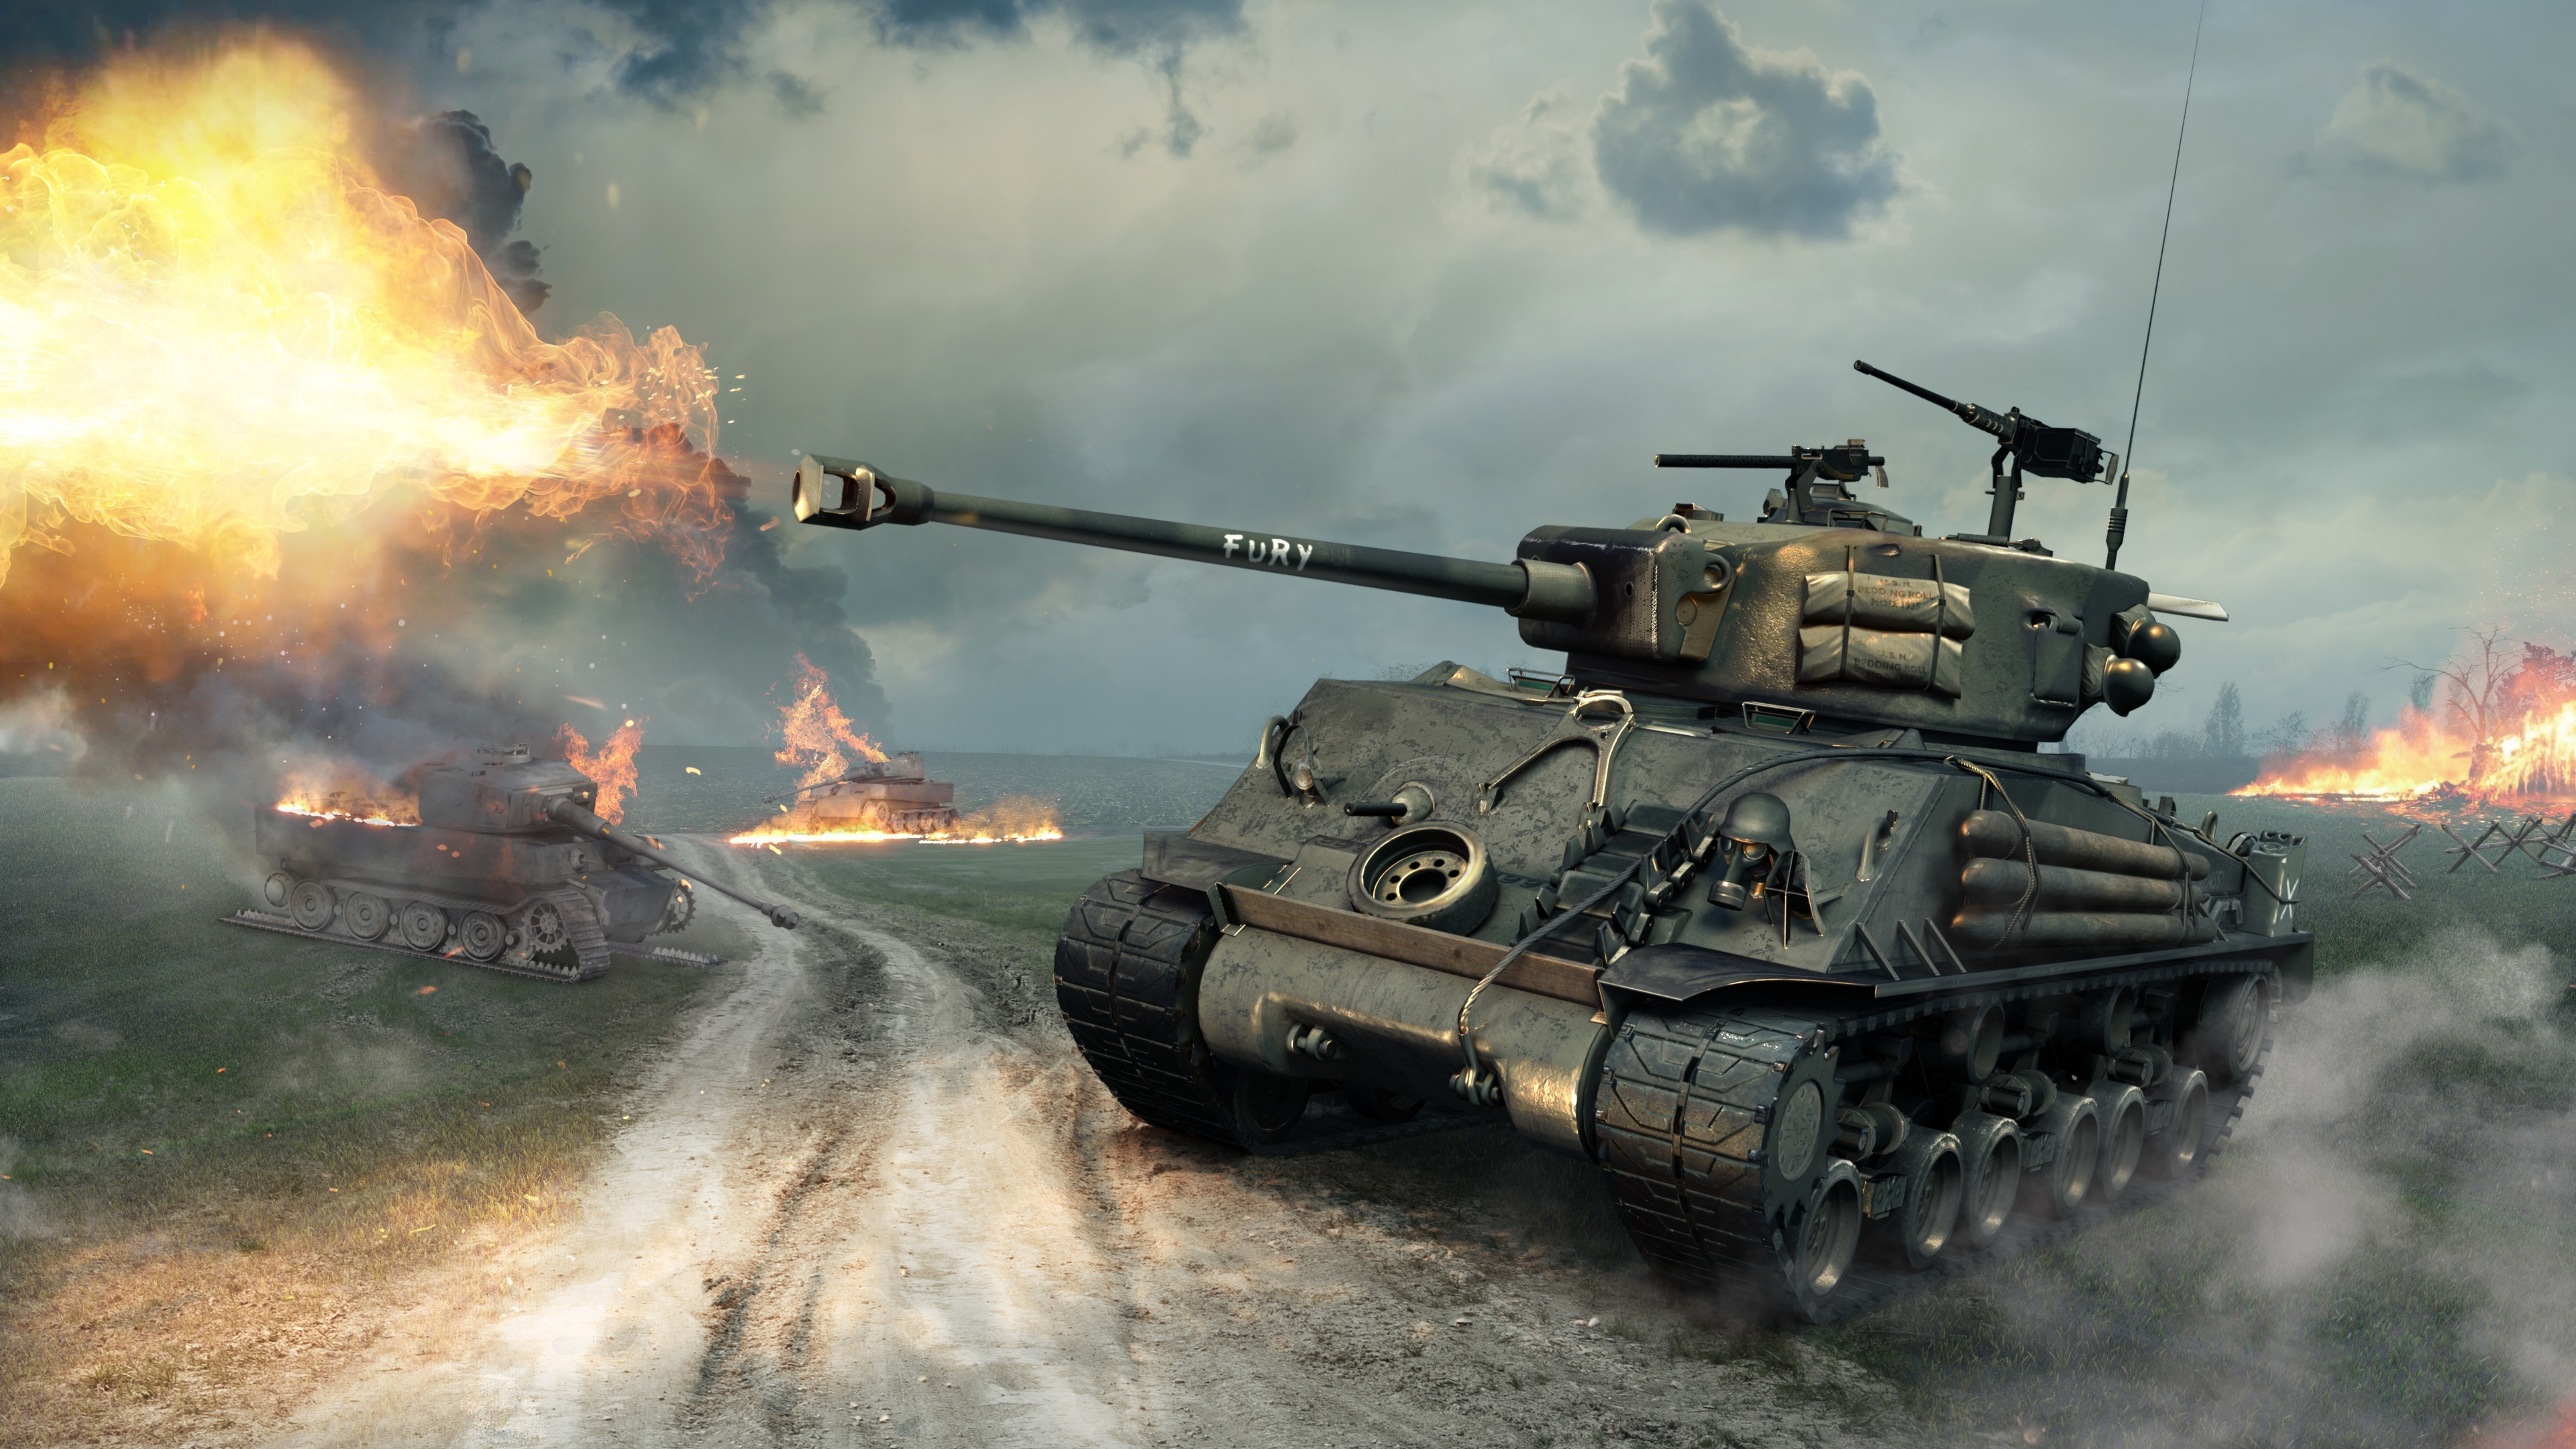 world of tanks world of tanks xbox 360 edition world of tanks blitz wargaming net m4a3e8 sherman m4a3e8 sherman fury 4k 1538945005 - world of tanks, world of tanks xbox 360 edition, world of tanks blitz, wargaming net, m4a3e8 sherman, m4a3e8 sherman fury 4k - world of tanks xbox 360 edition, world of tanks blitz, world of tanks